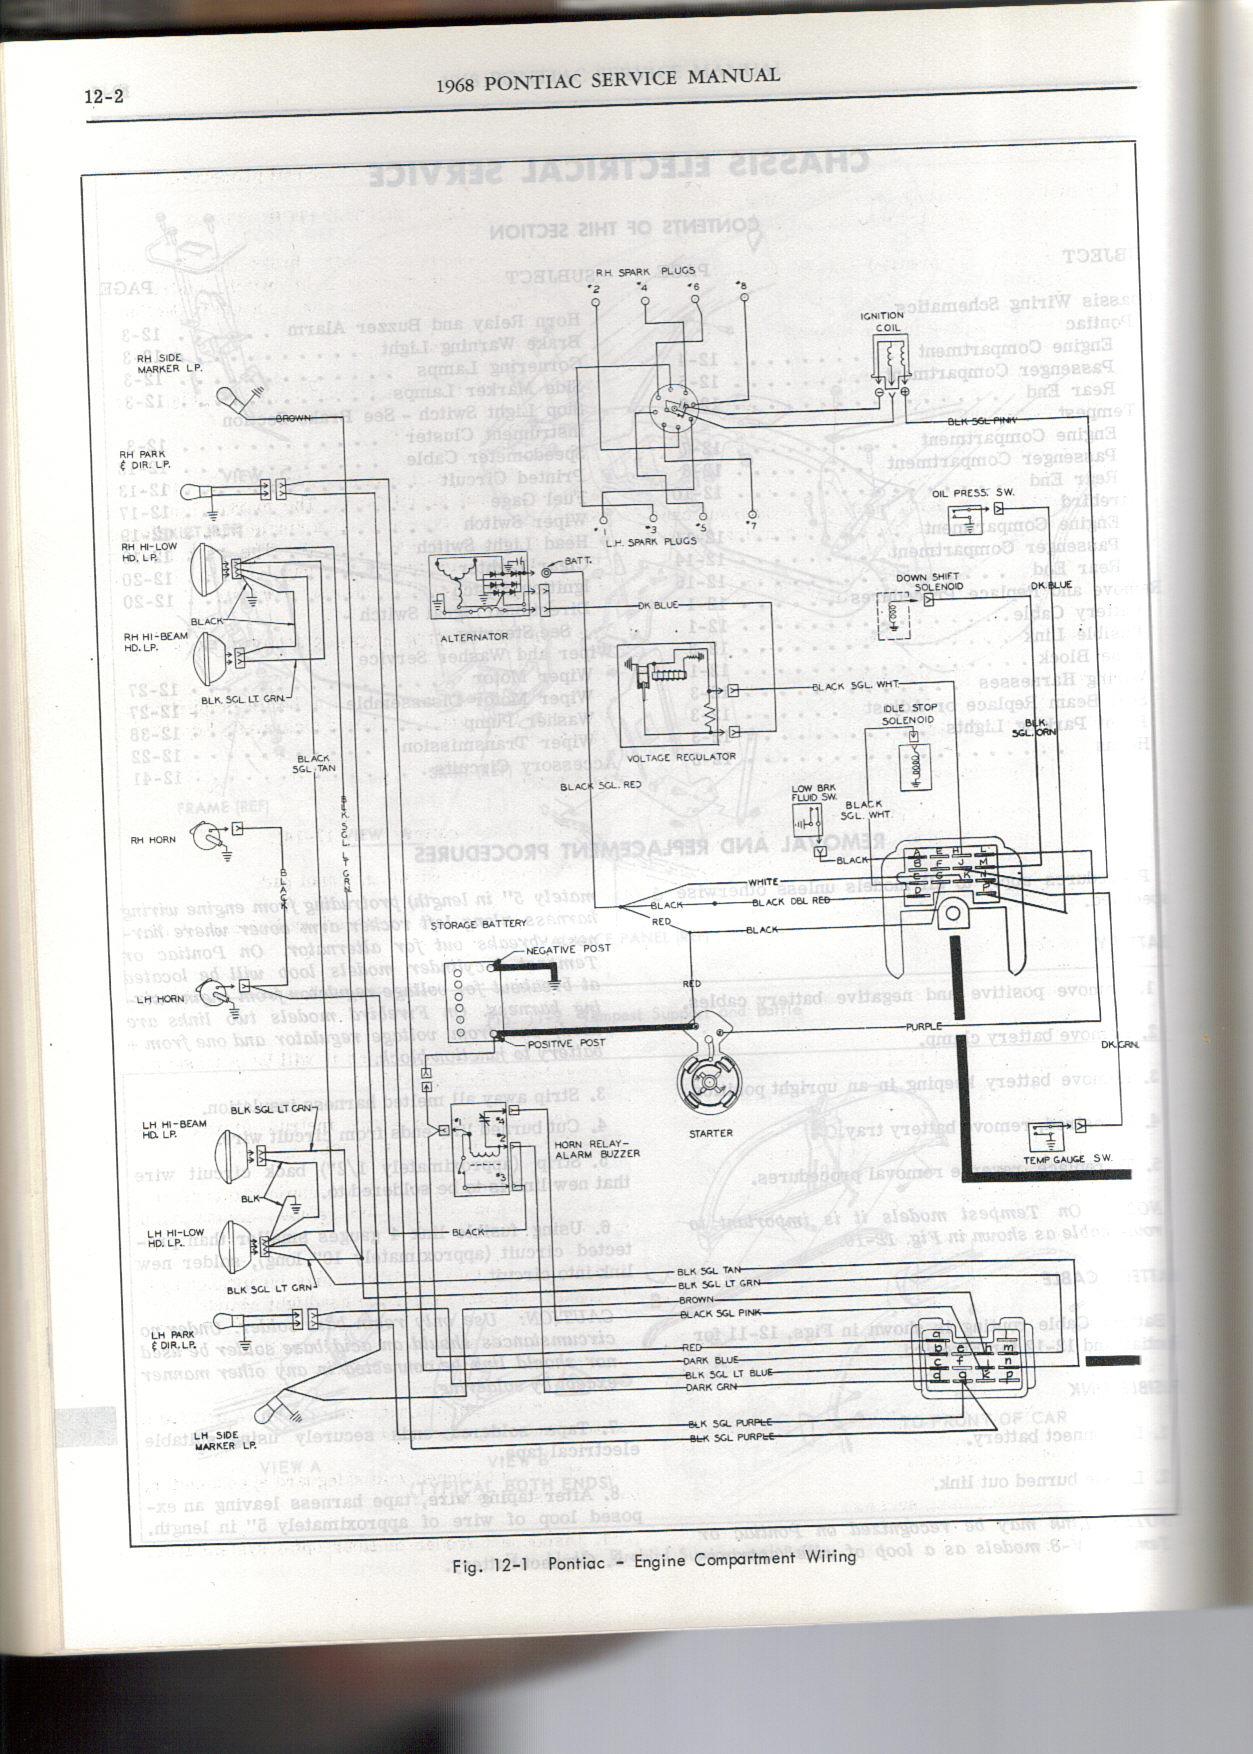 40 Gto Dash Wiring Diagram   Diagram & Symbol Wiring device creed ...